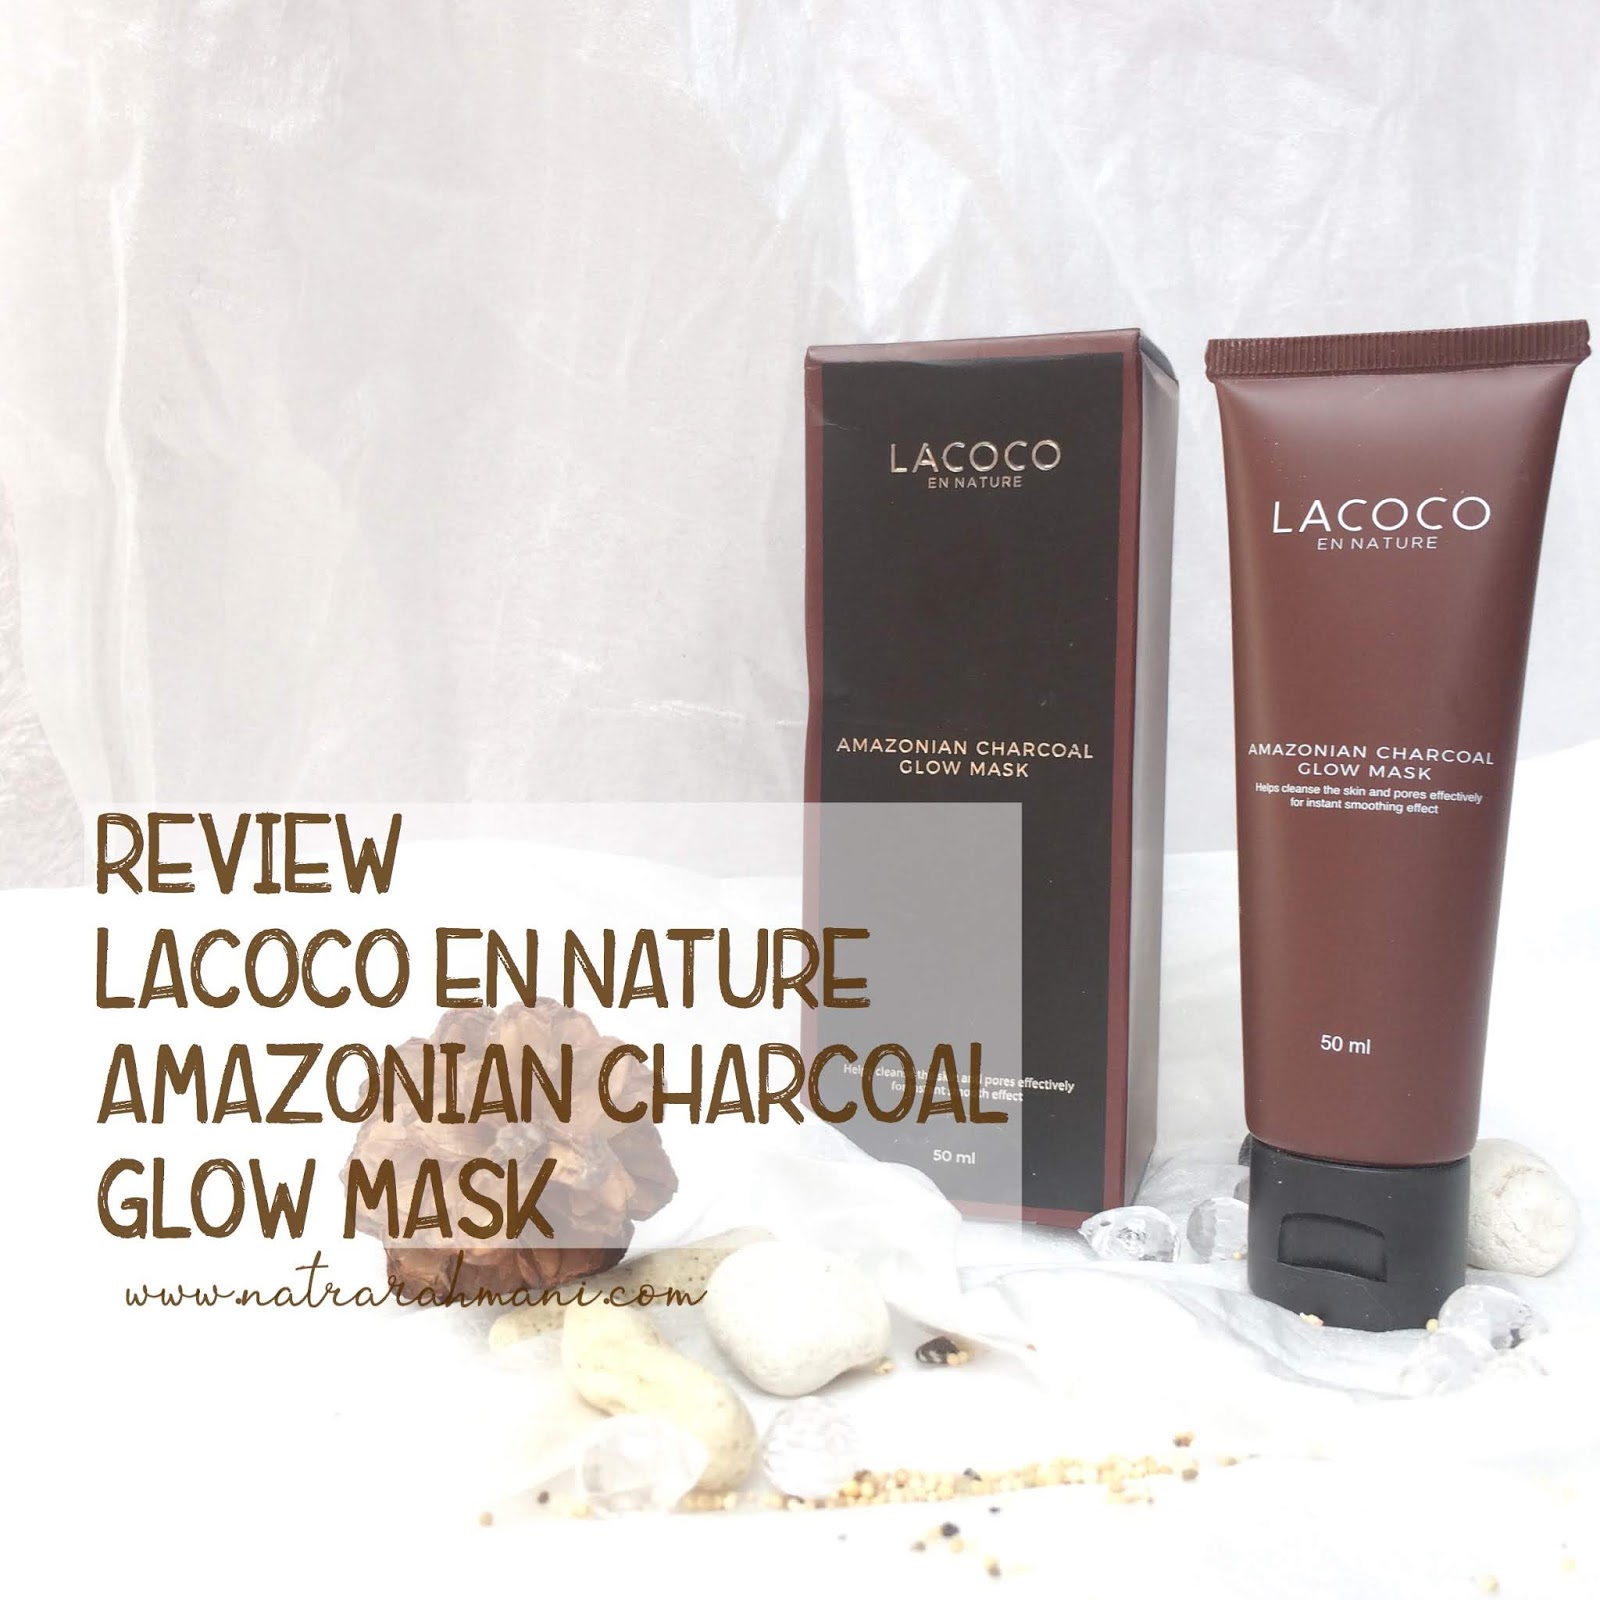 lacoco-amazonian-charcoal-glow-mask-natrarahmani